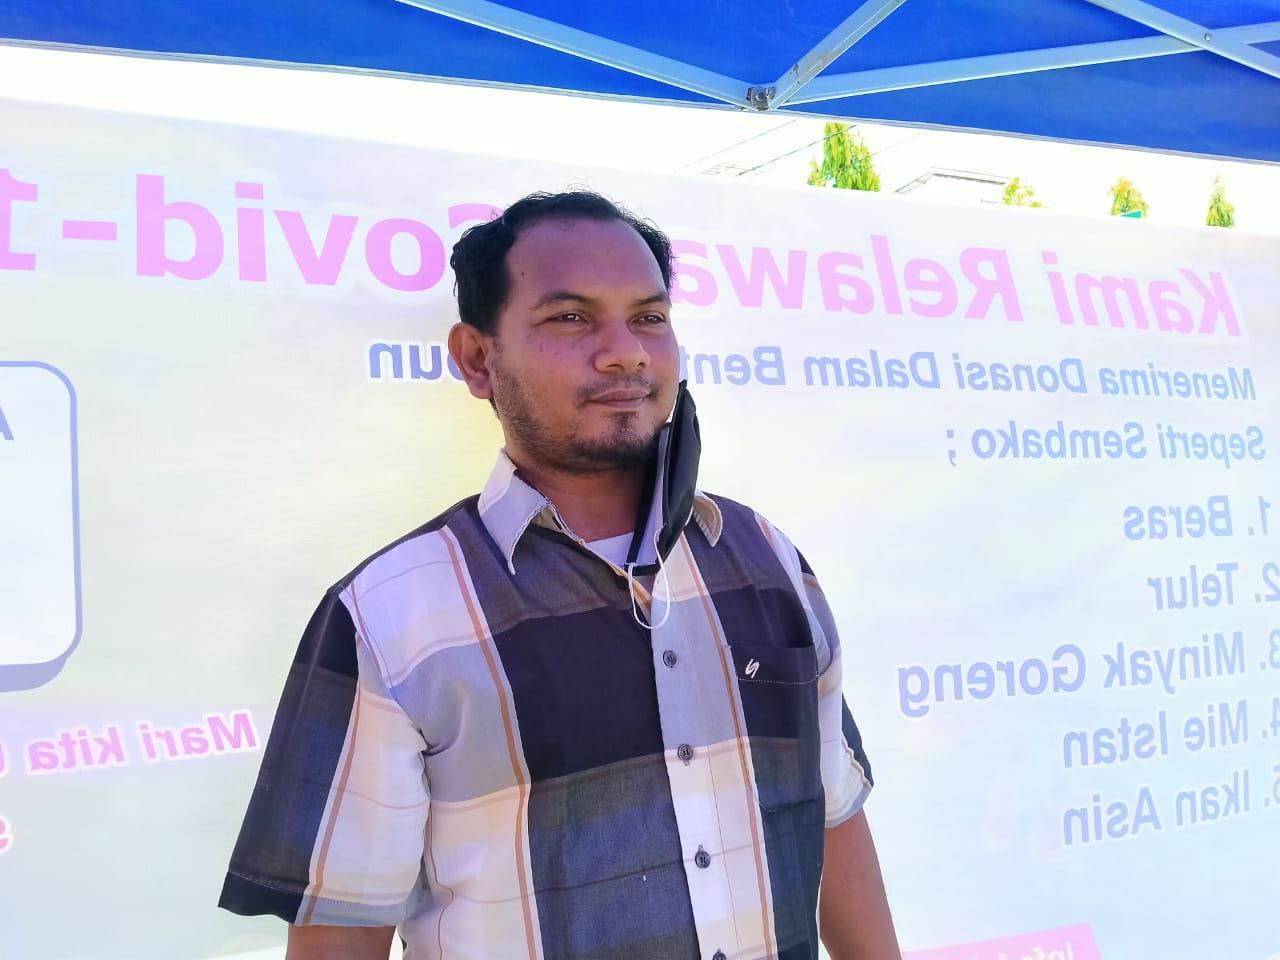 Koalisi NGO HAM Aceh: Posko Tim Gugus Covid-19 Bireuen Harus Jelas Agenda